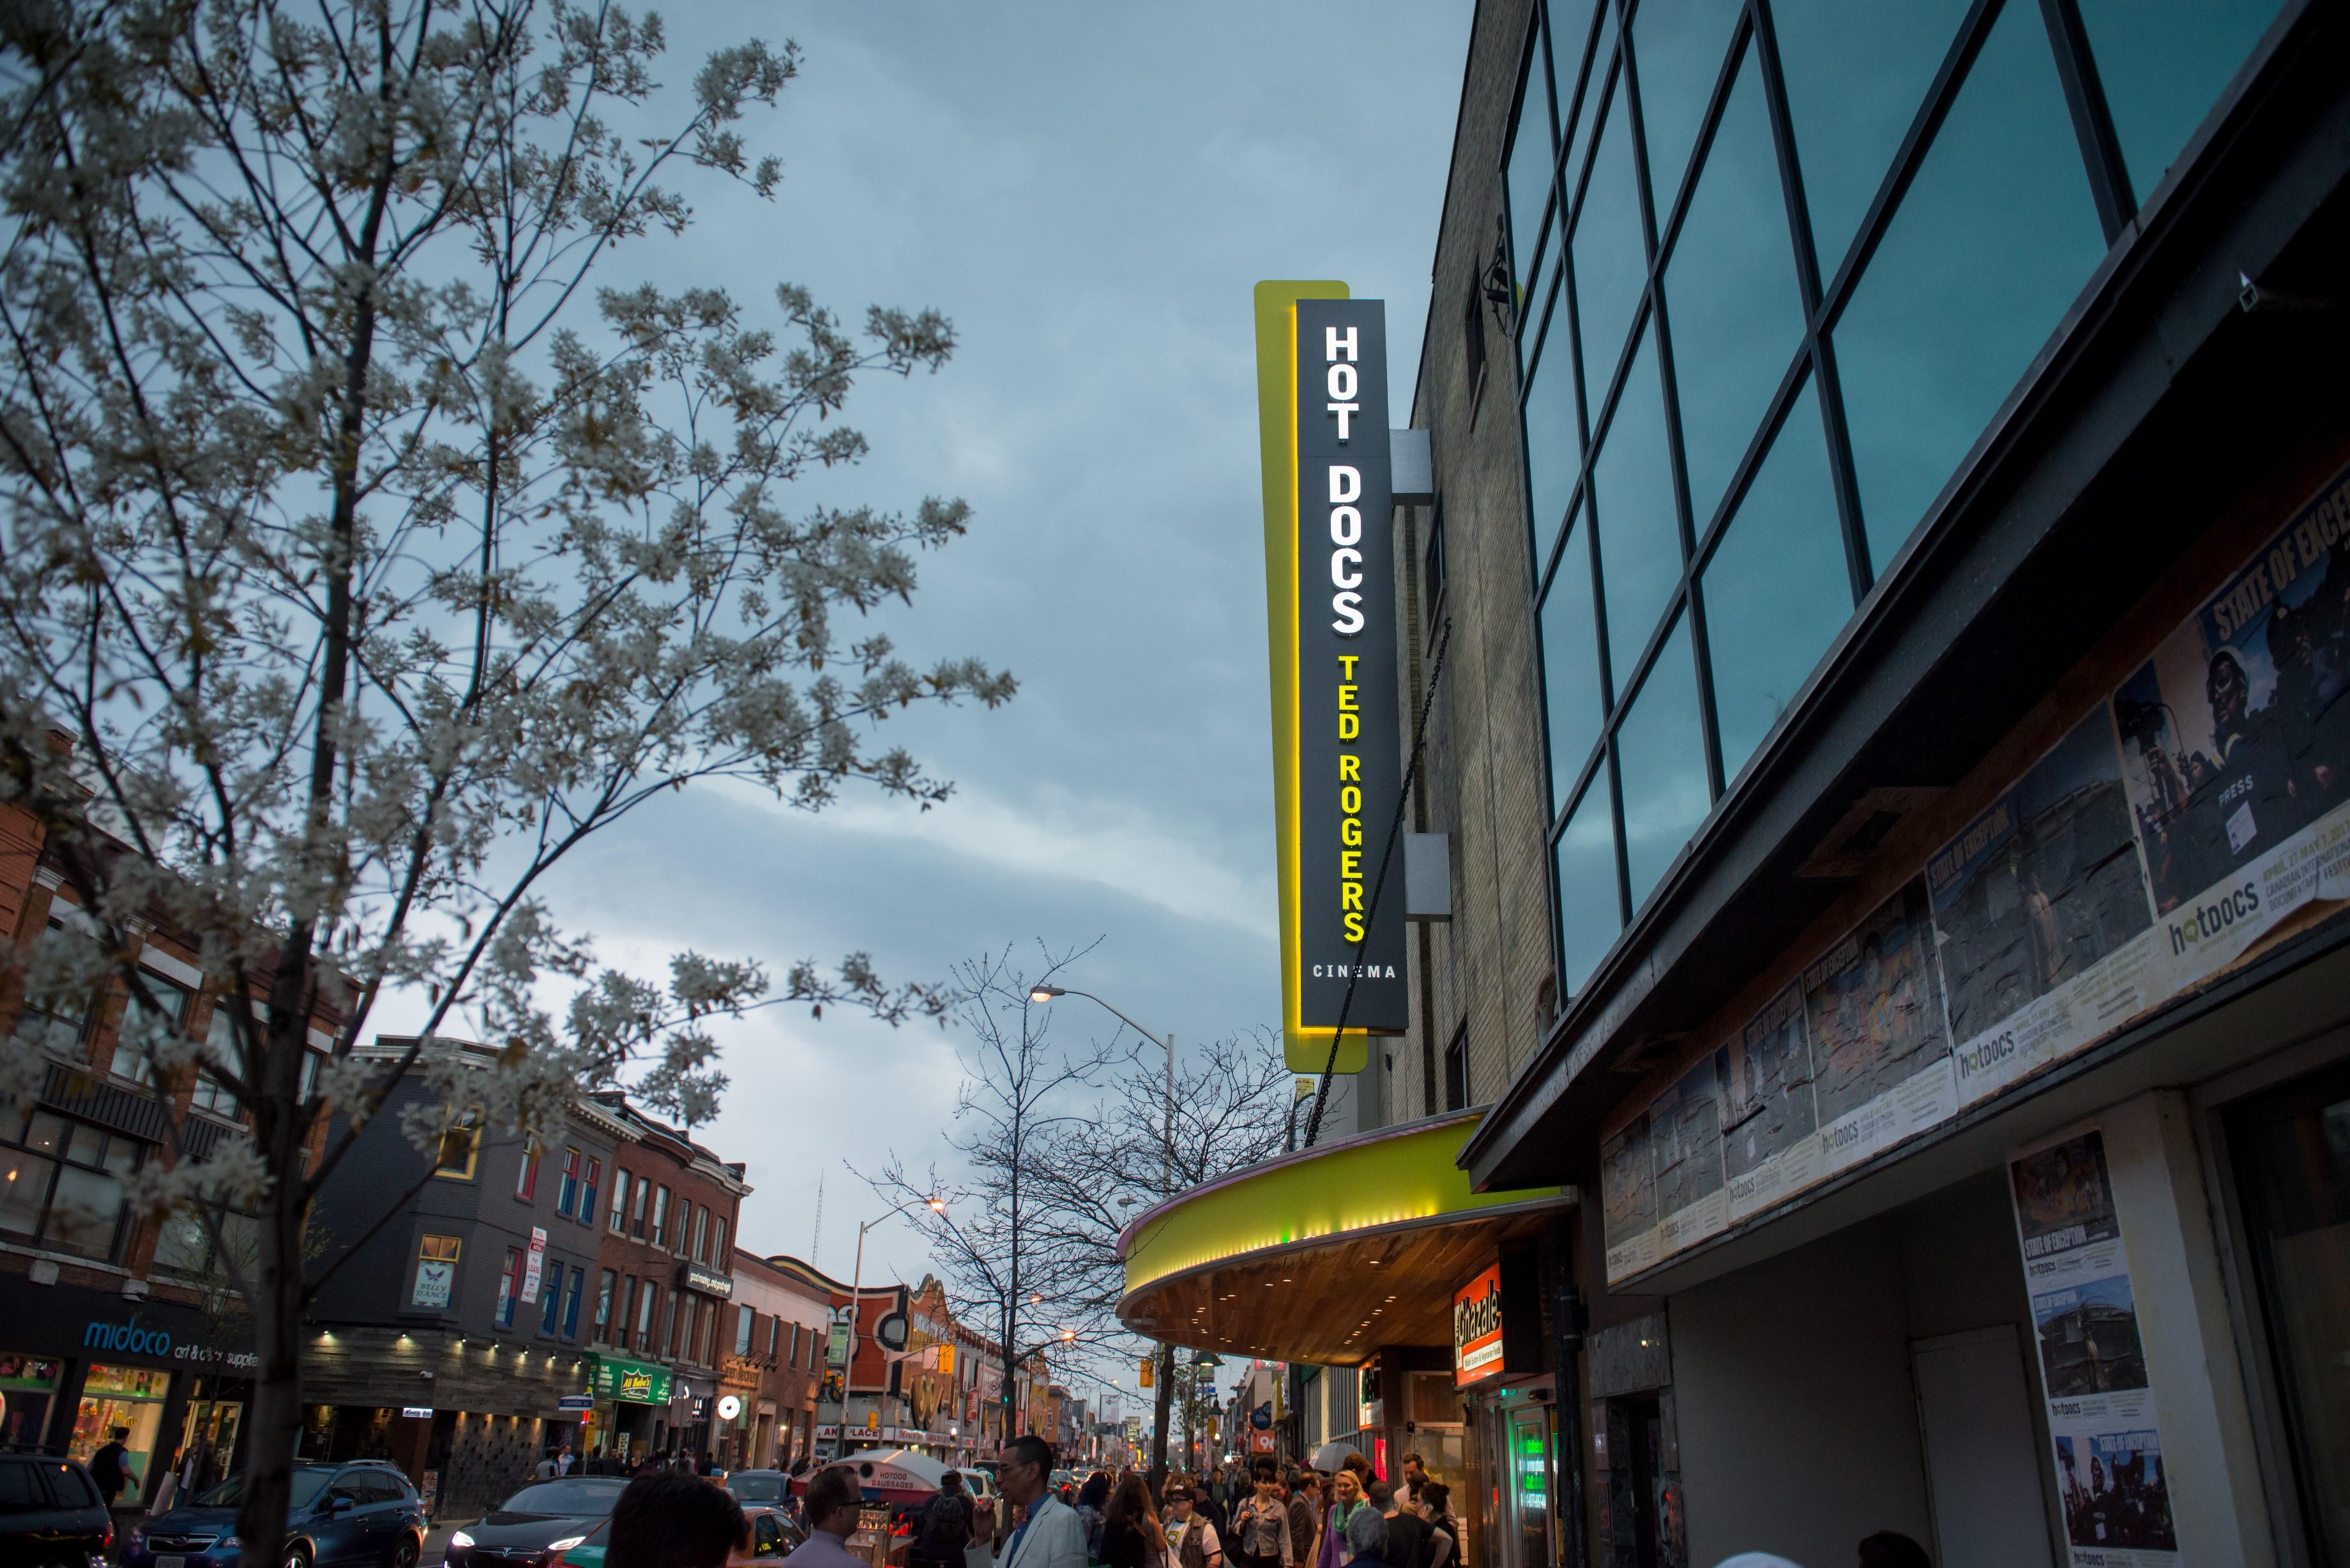 Hot Docs Ted Rogers Cinema - Toronto